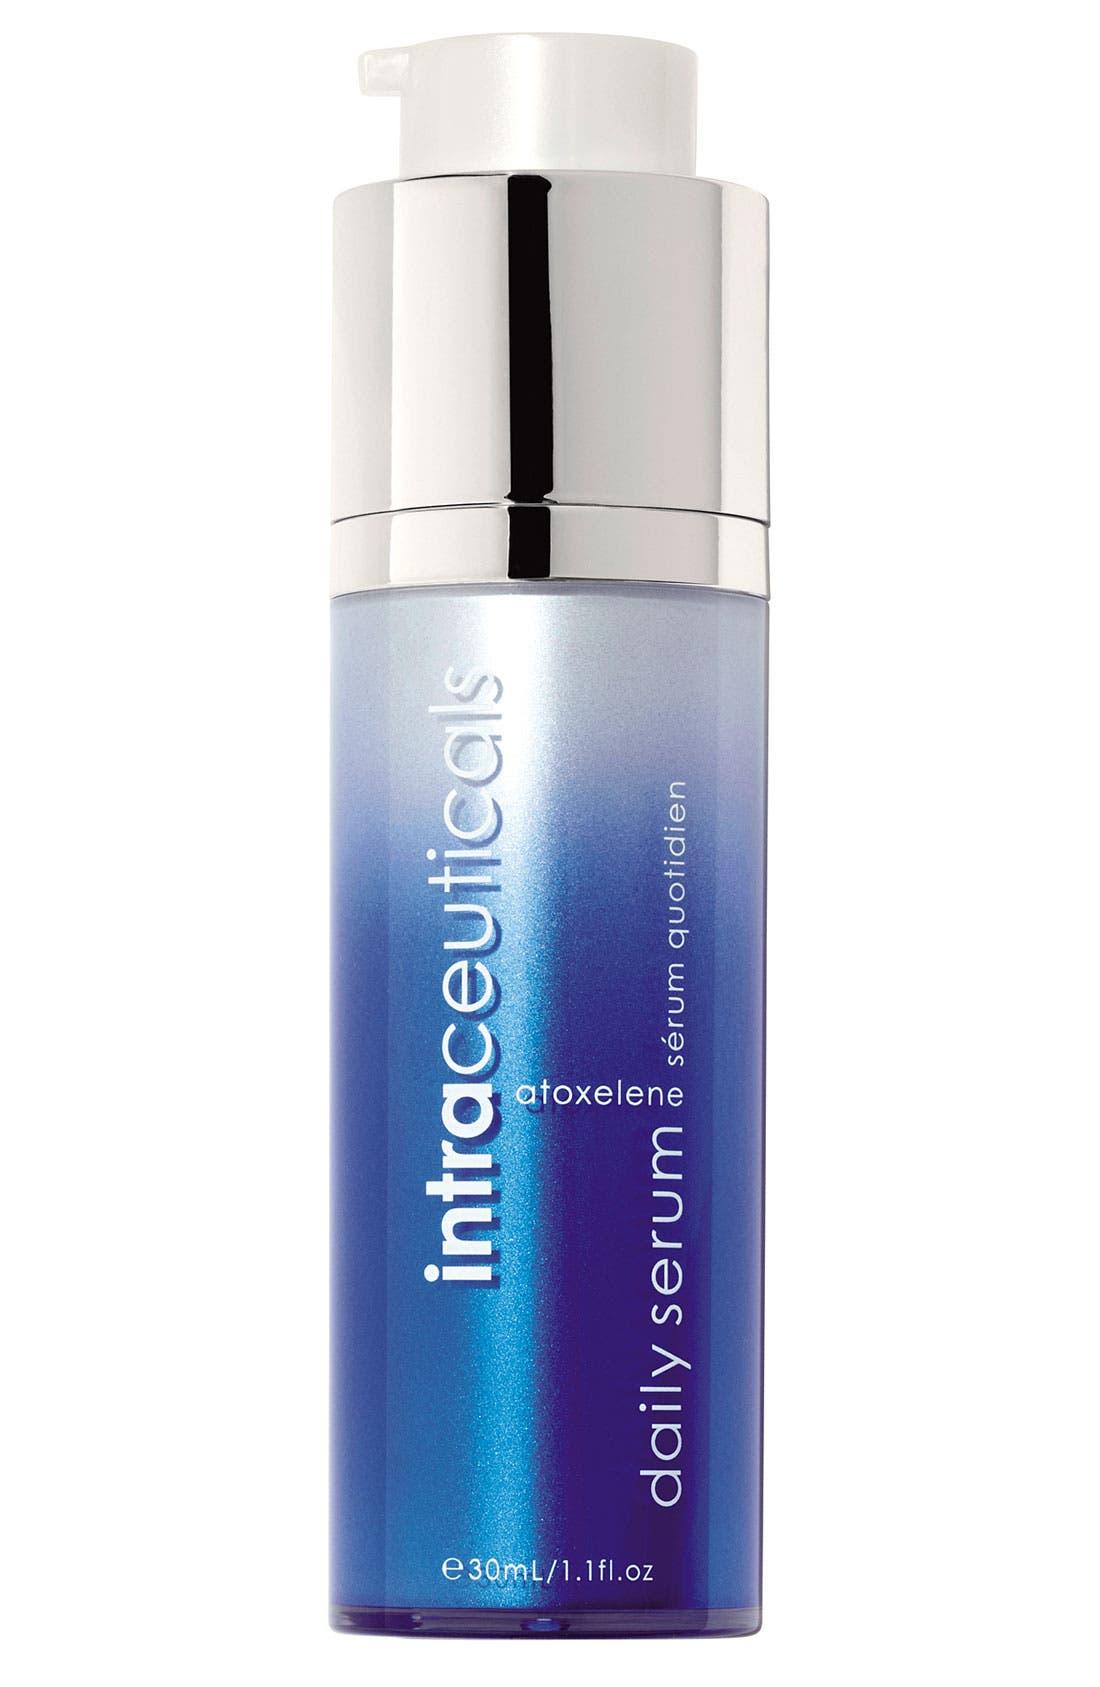 intraceuticals® 'Atoxelene' Daily Serum